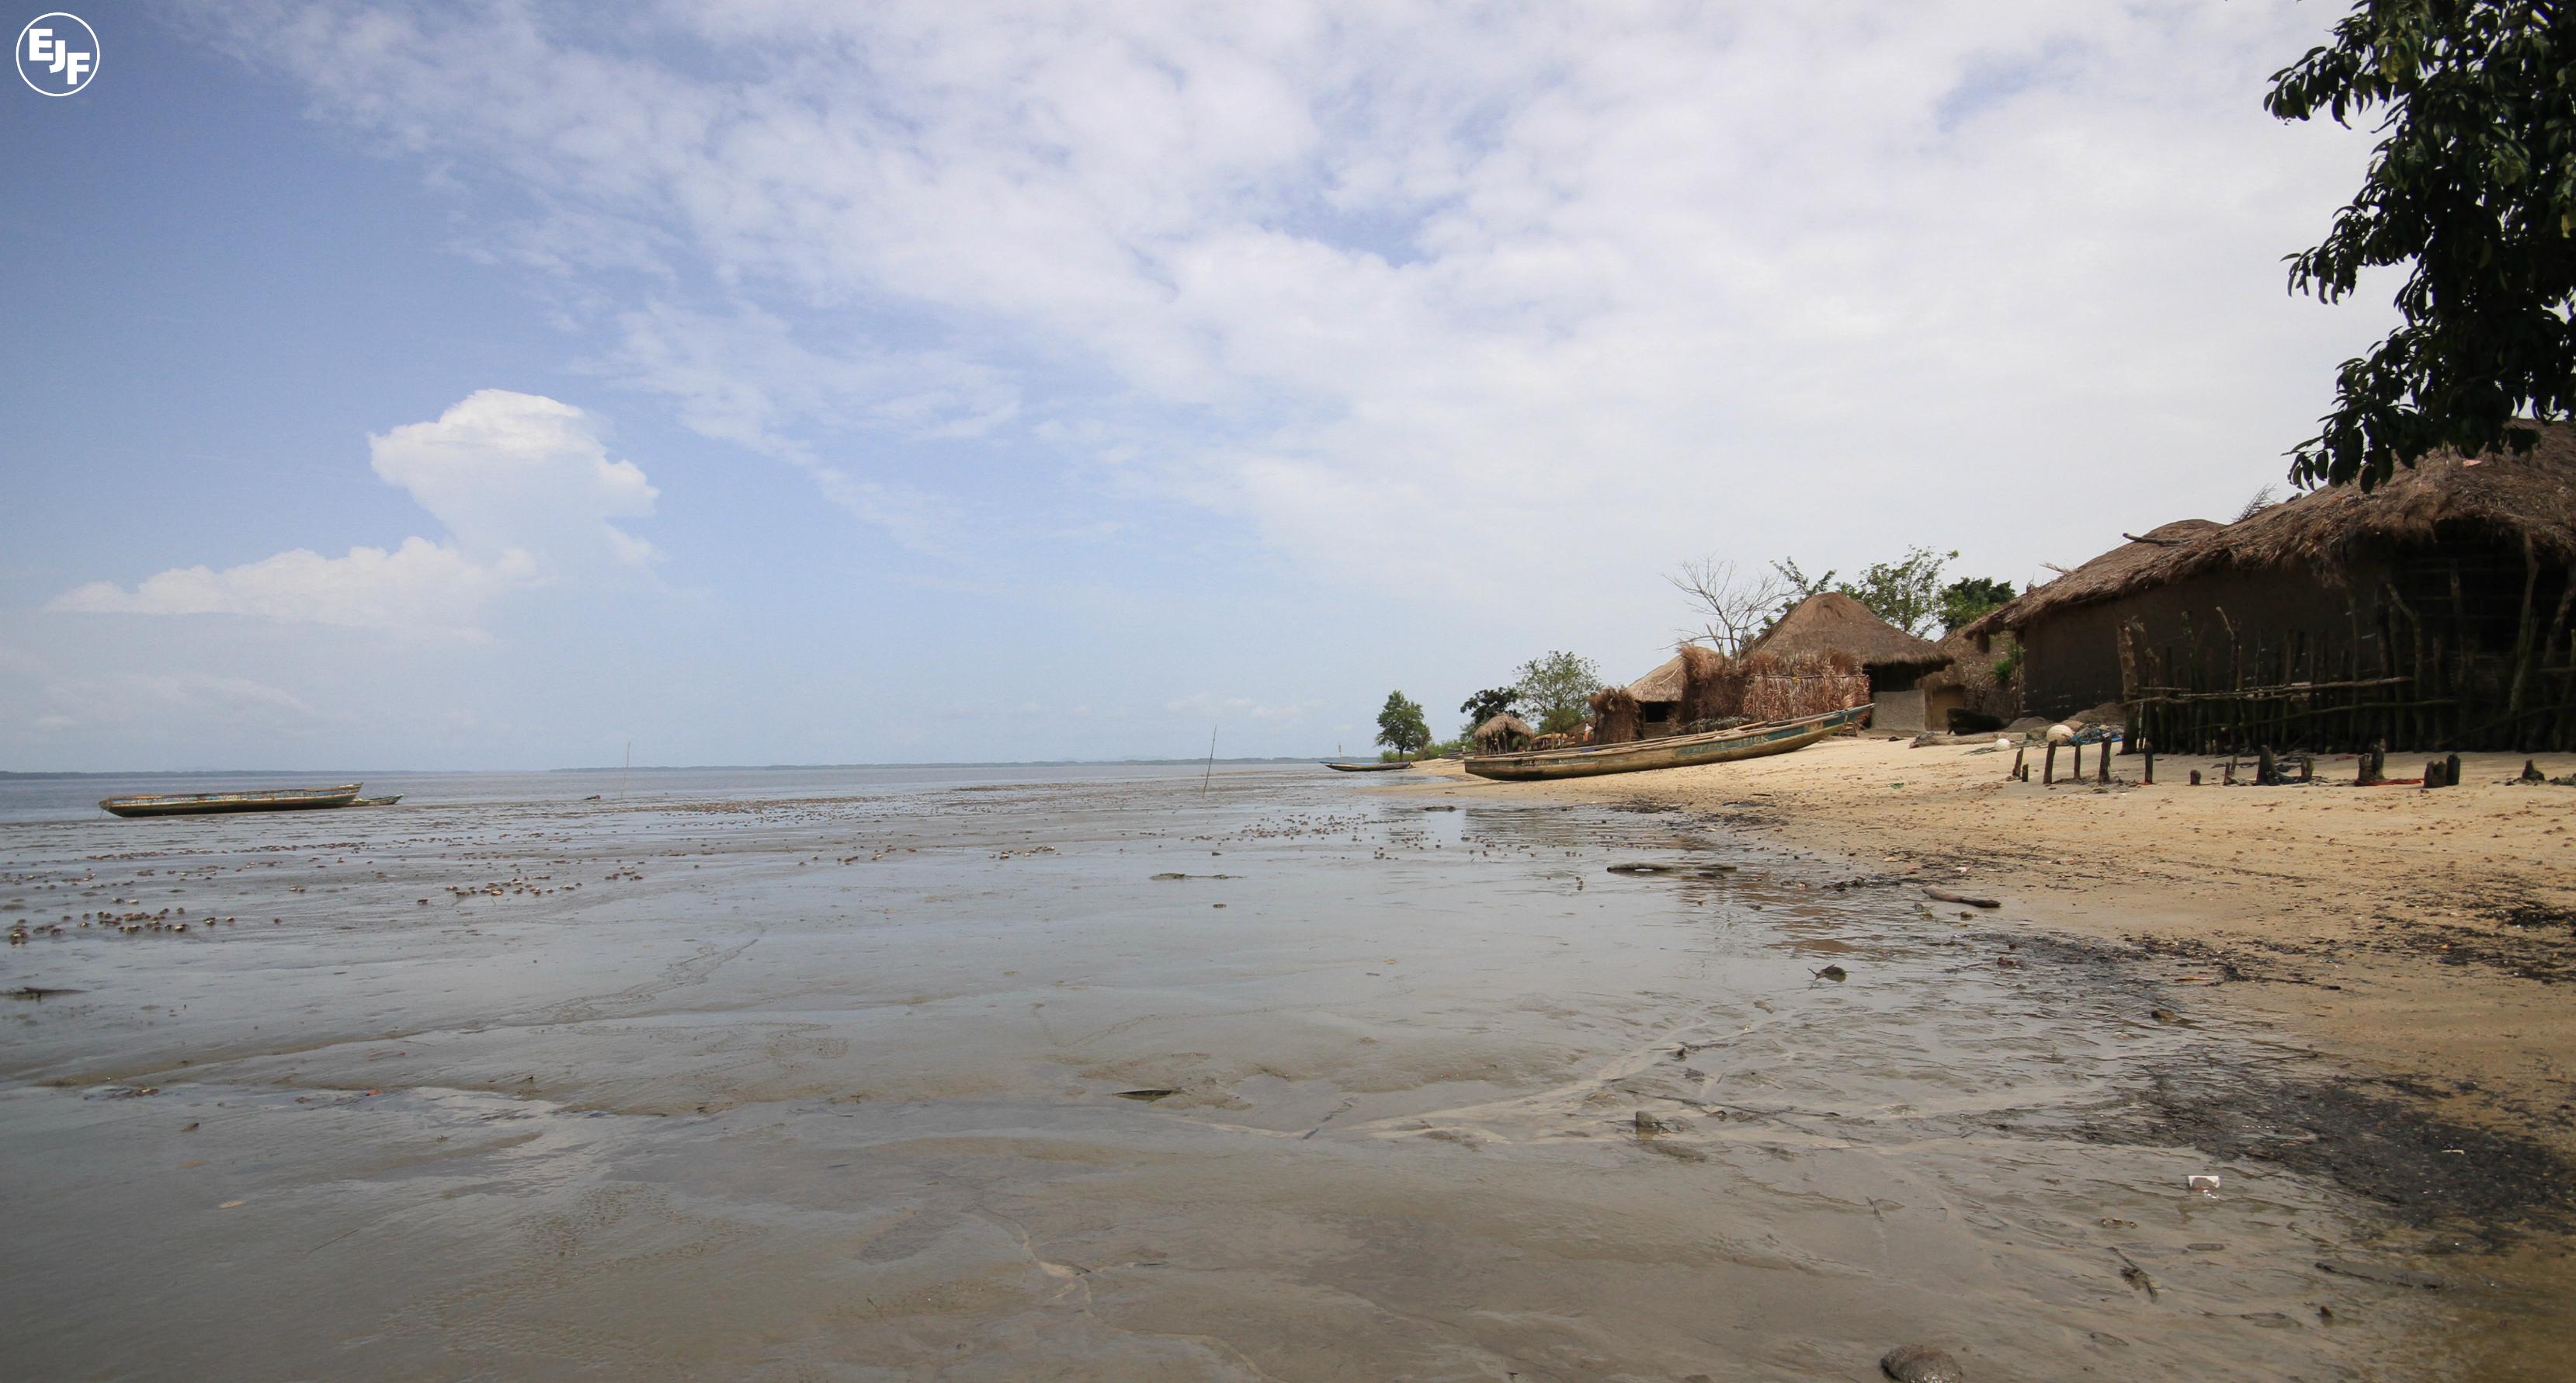 Communities in Sierra Leone devastated by tornado